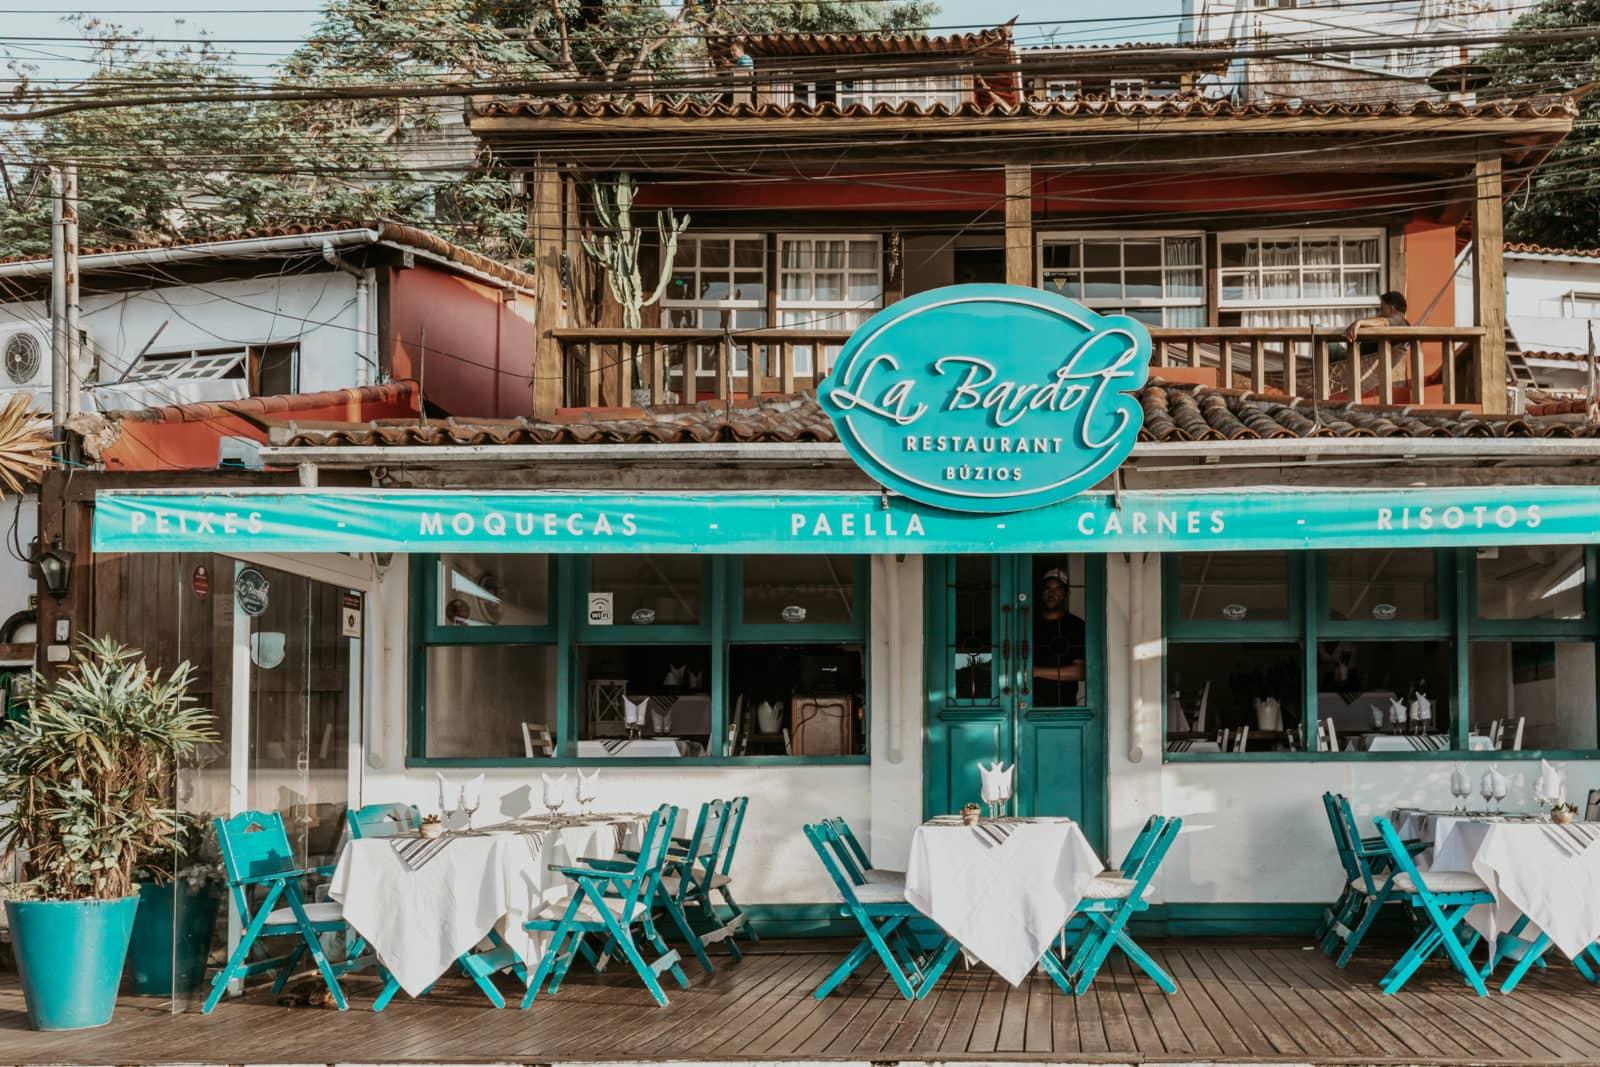 Restaurant La Bardot in Buzios Brasilien